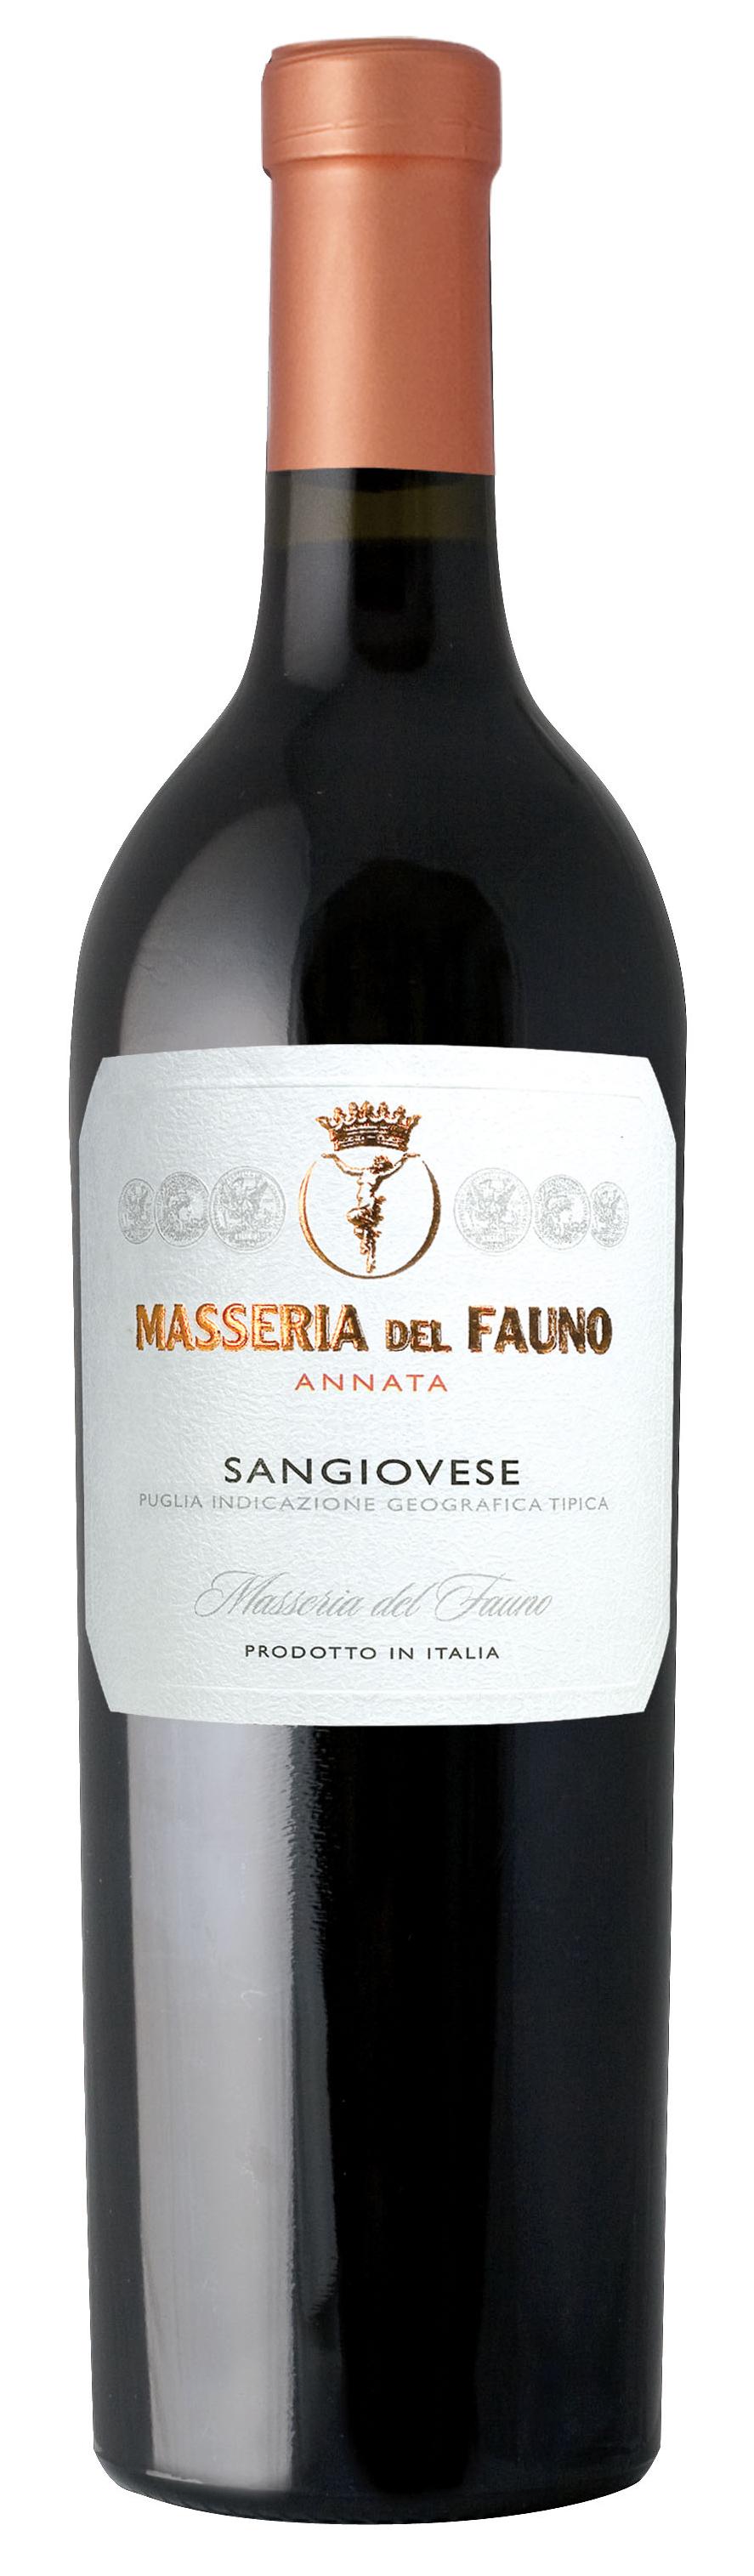 Sangiovese_Masseria[1].jpg